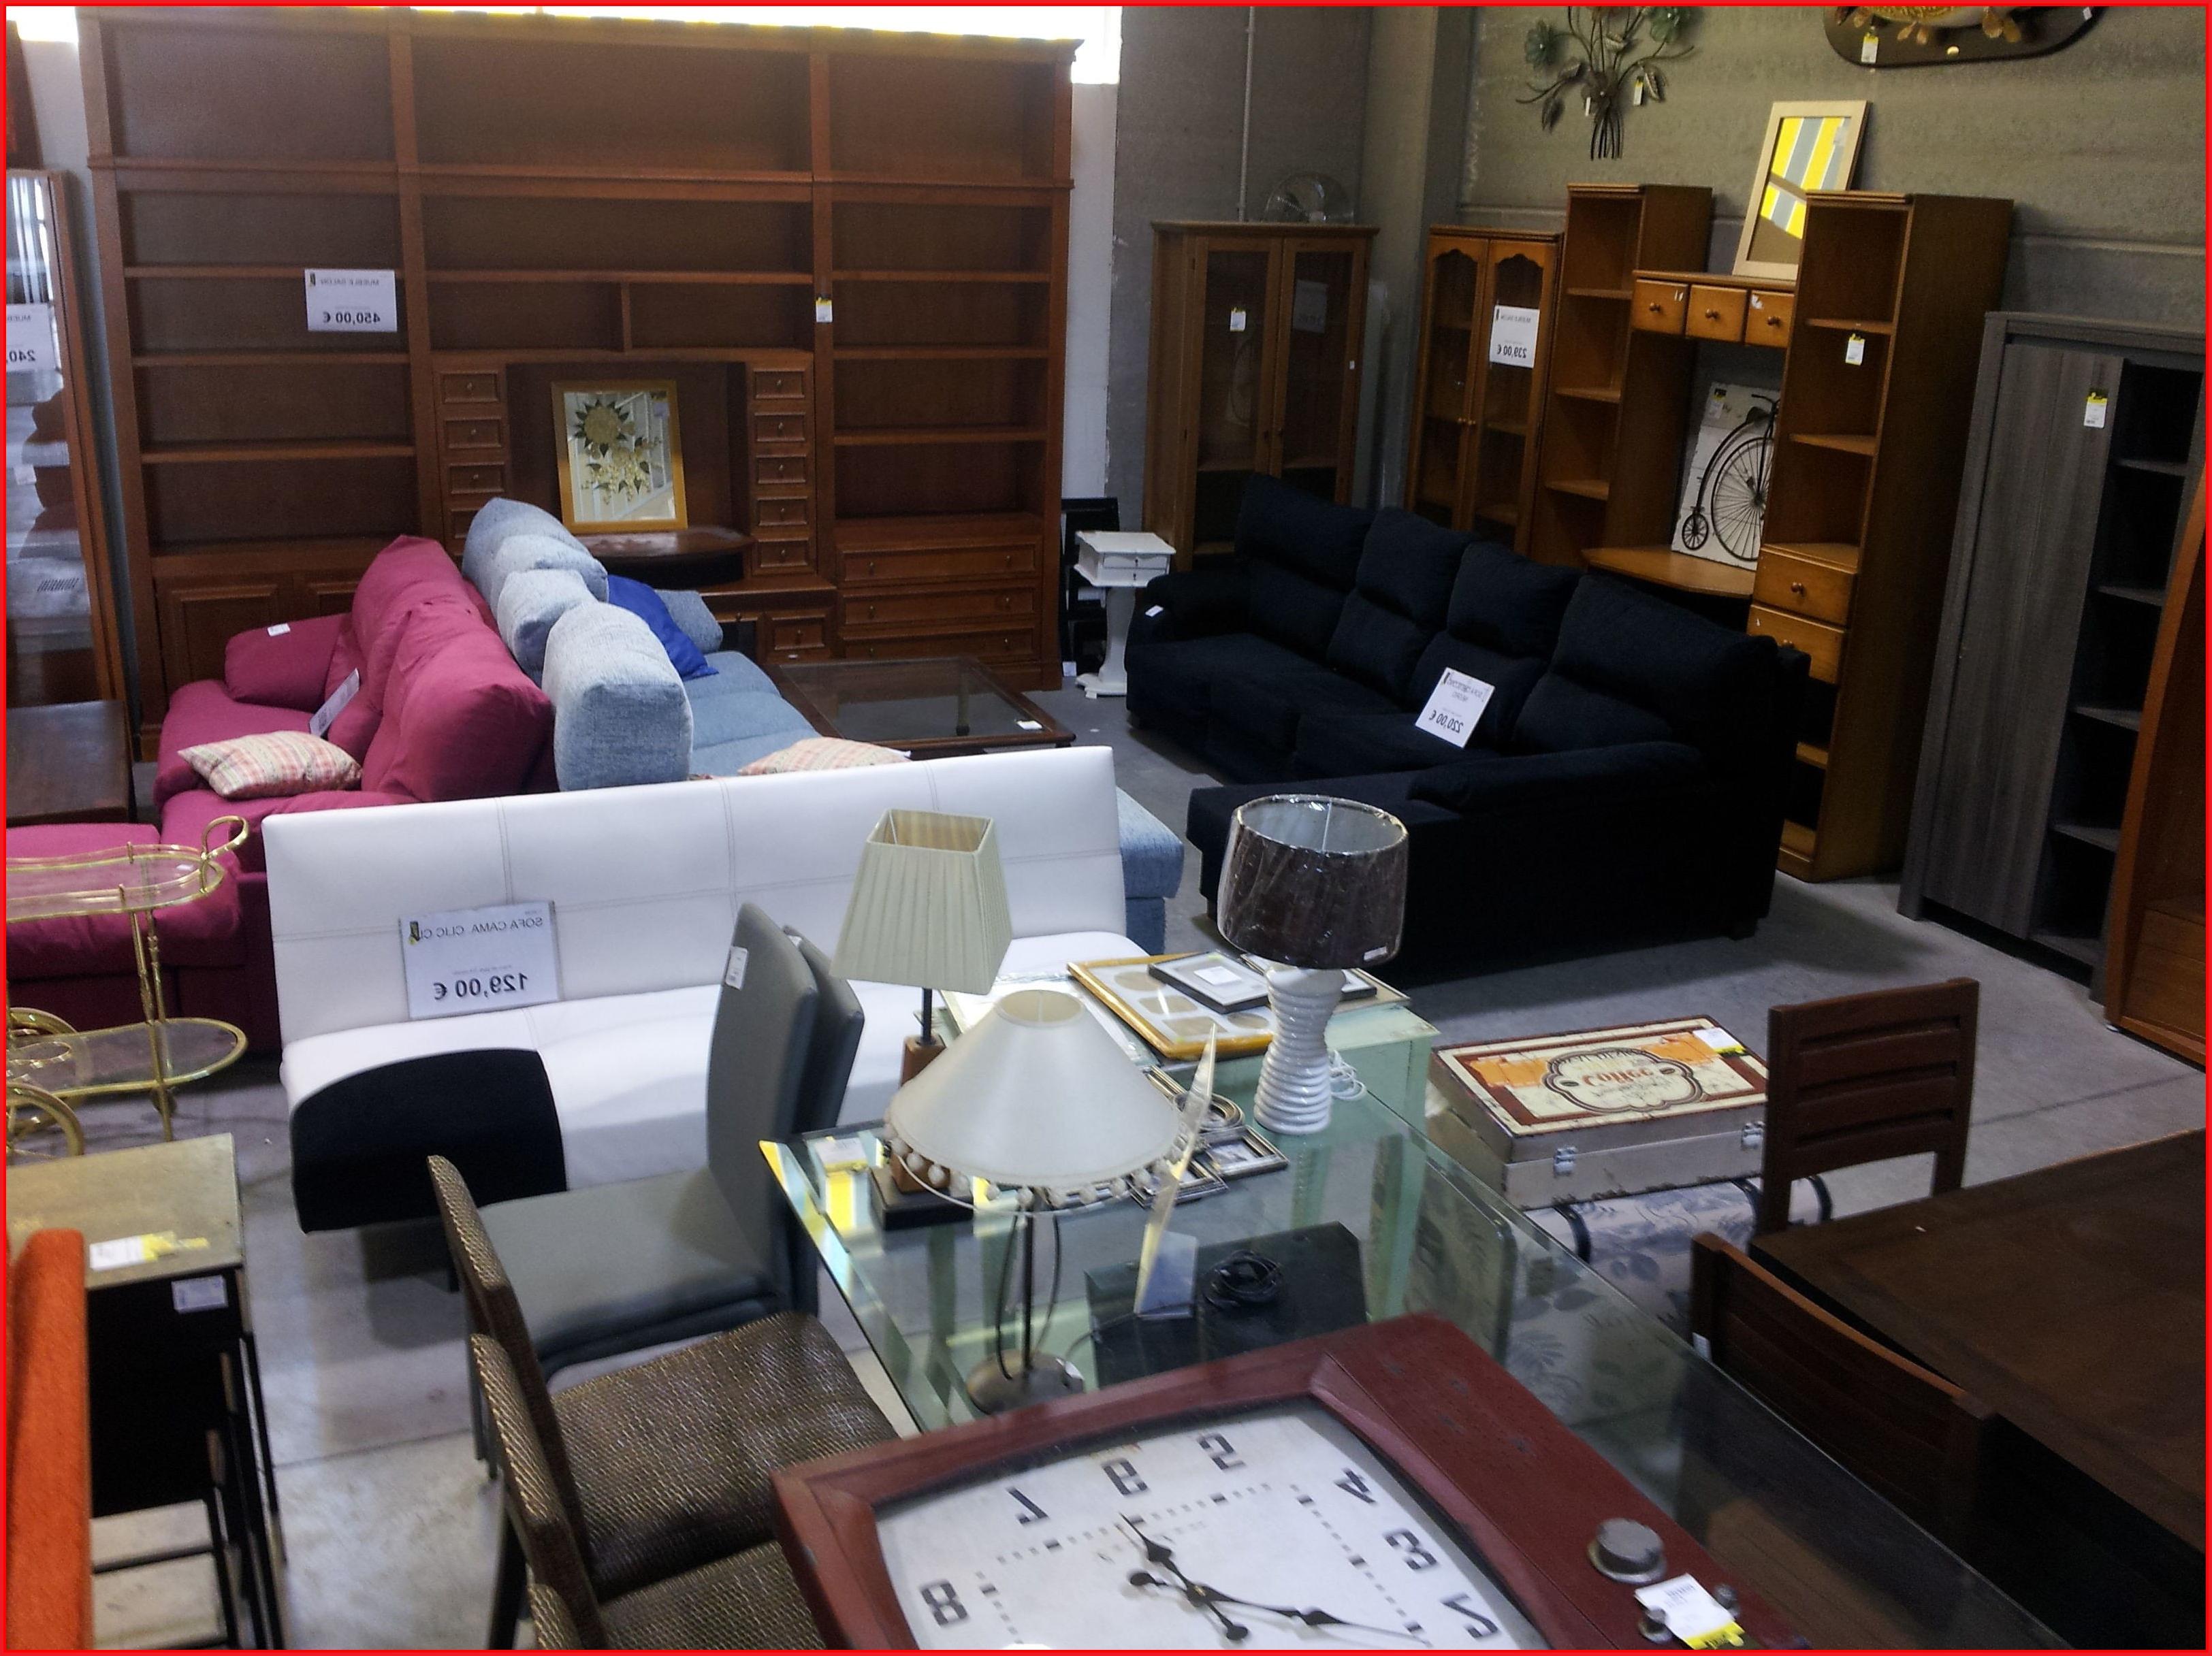 Vender Muebles De Segunda Mano Q0d4 Vender Muebles De Segunda Mano Pro Muebles Segunda Mano Pra